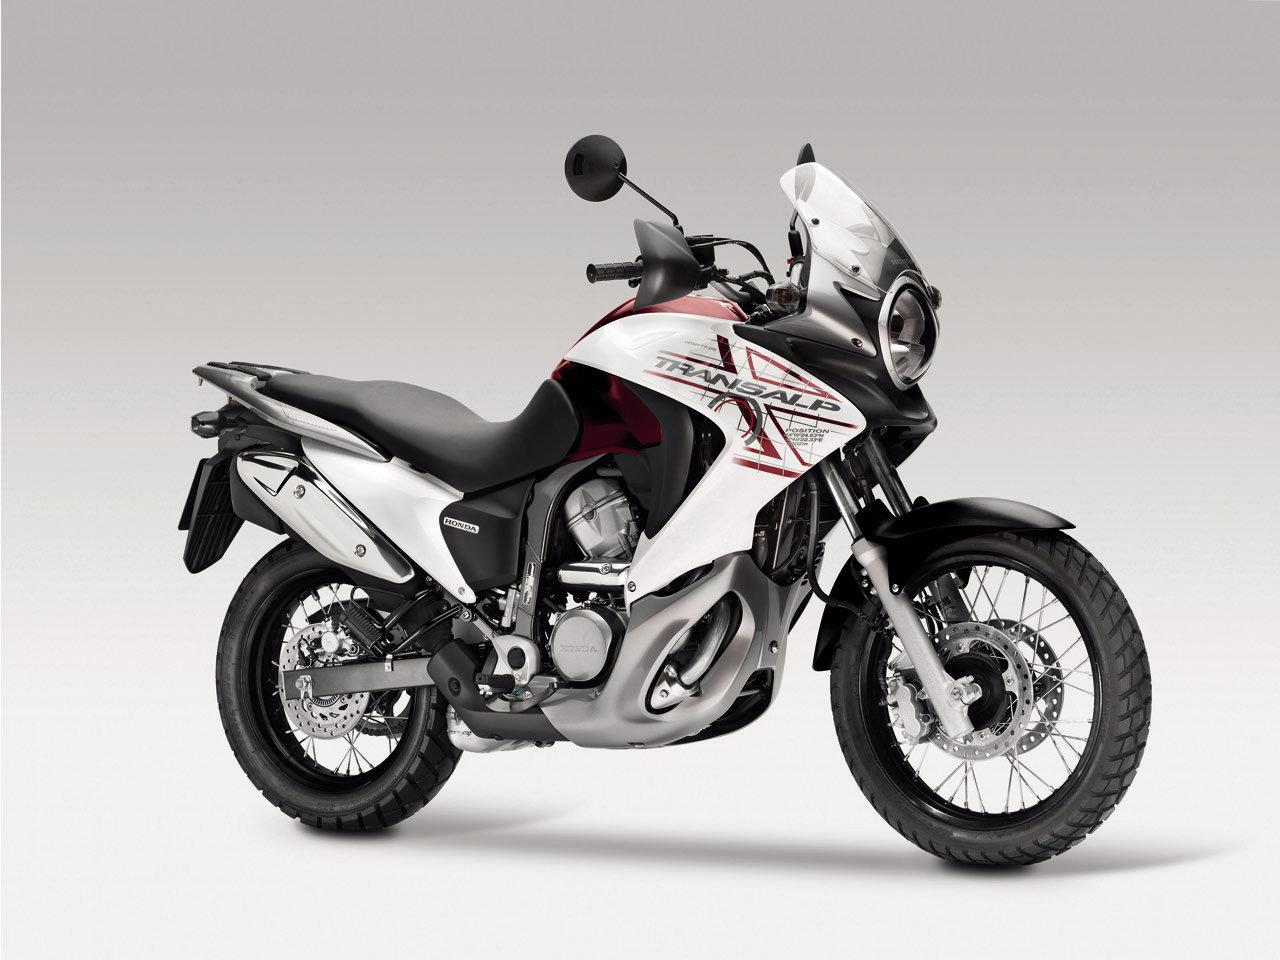 Listino Honda CB 500F Naked Media - image 14734_honda-transalpbase on http://moto.motori.net